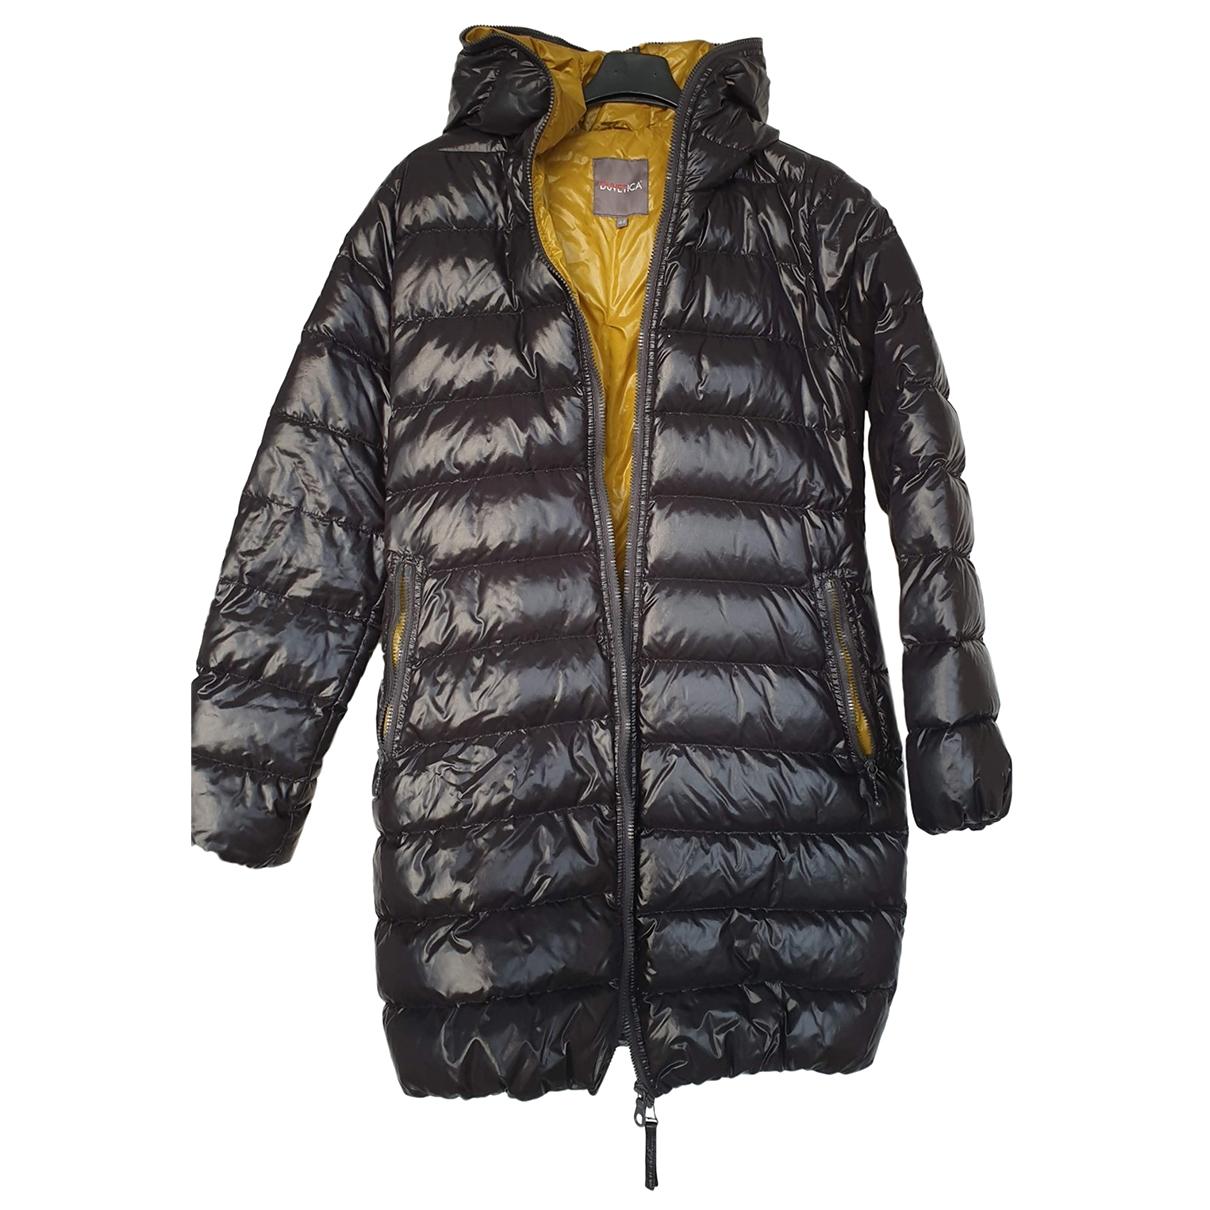 Duvetica \N Black coat for Women 44 IT